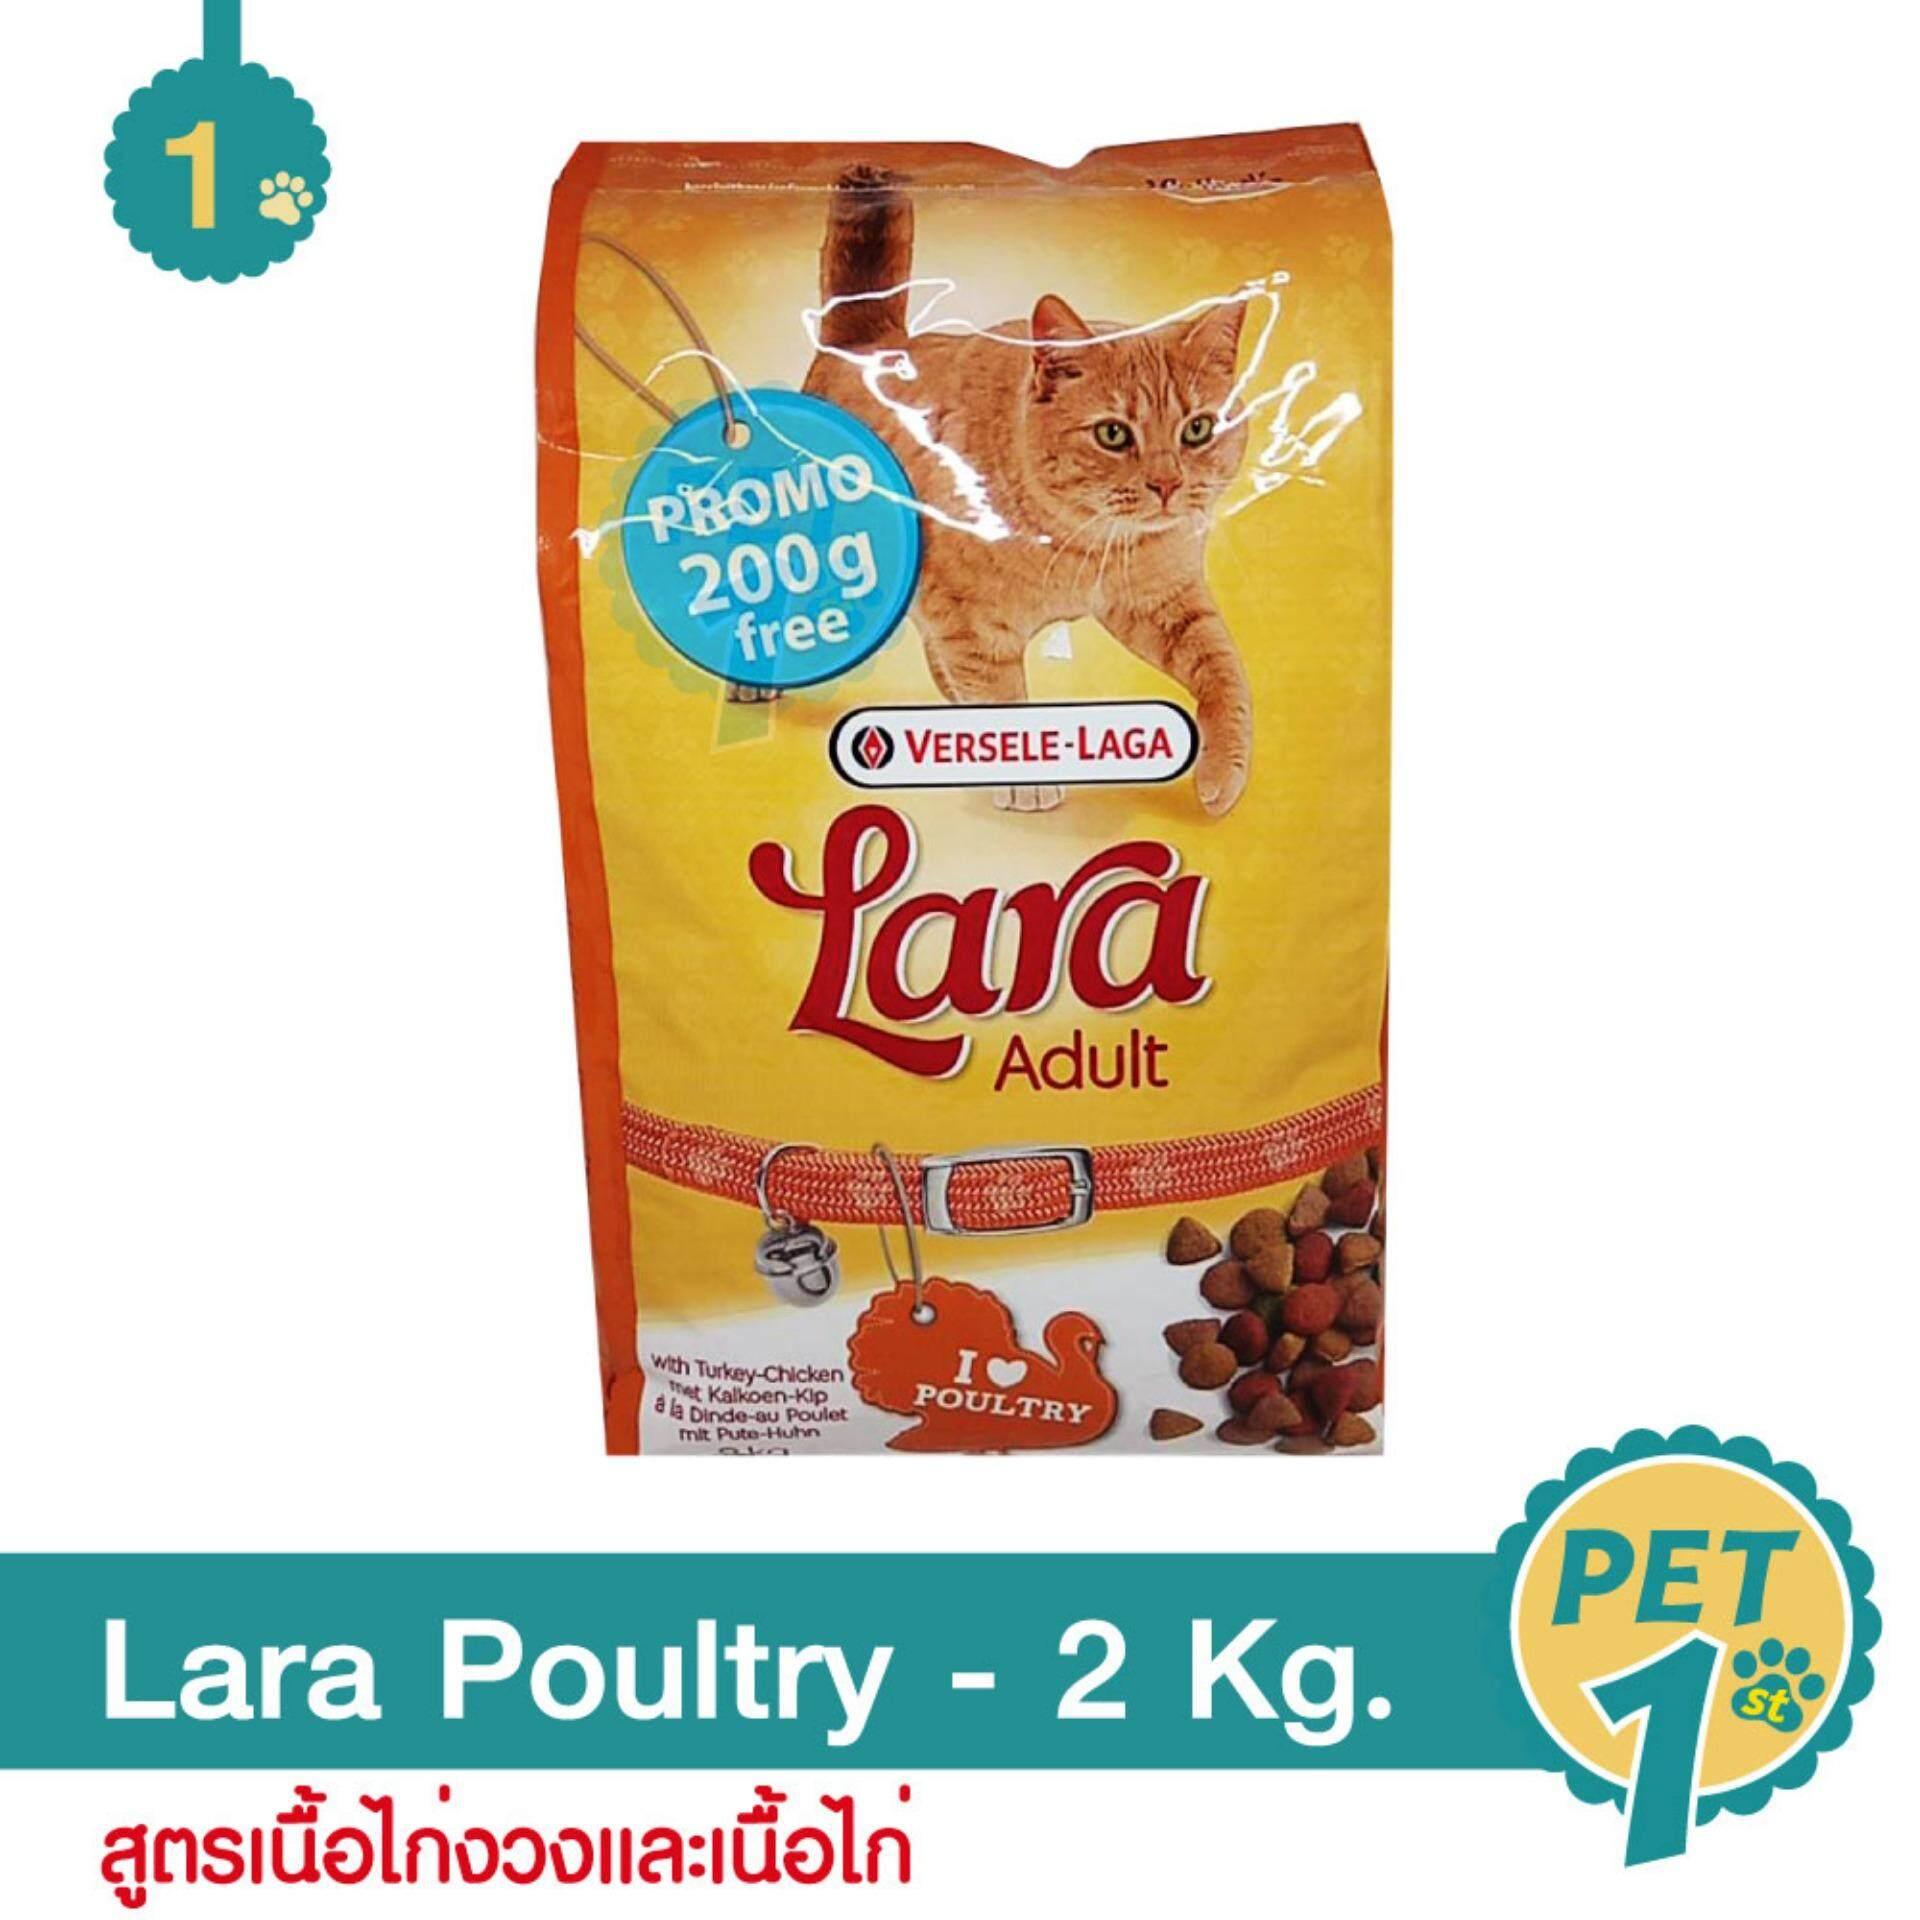 Lara Poultry อาหารสำหรับสำหรับแมวโต สูตรเนื้อไก่งวงและเนื้อไก่ 2 Kg. By Pet First.